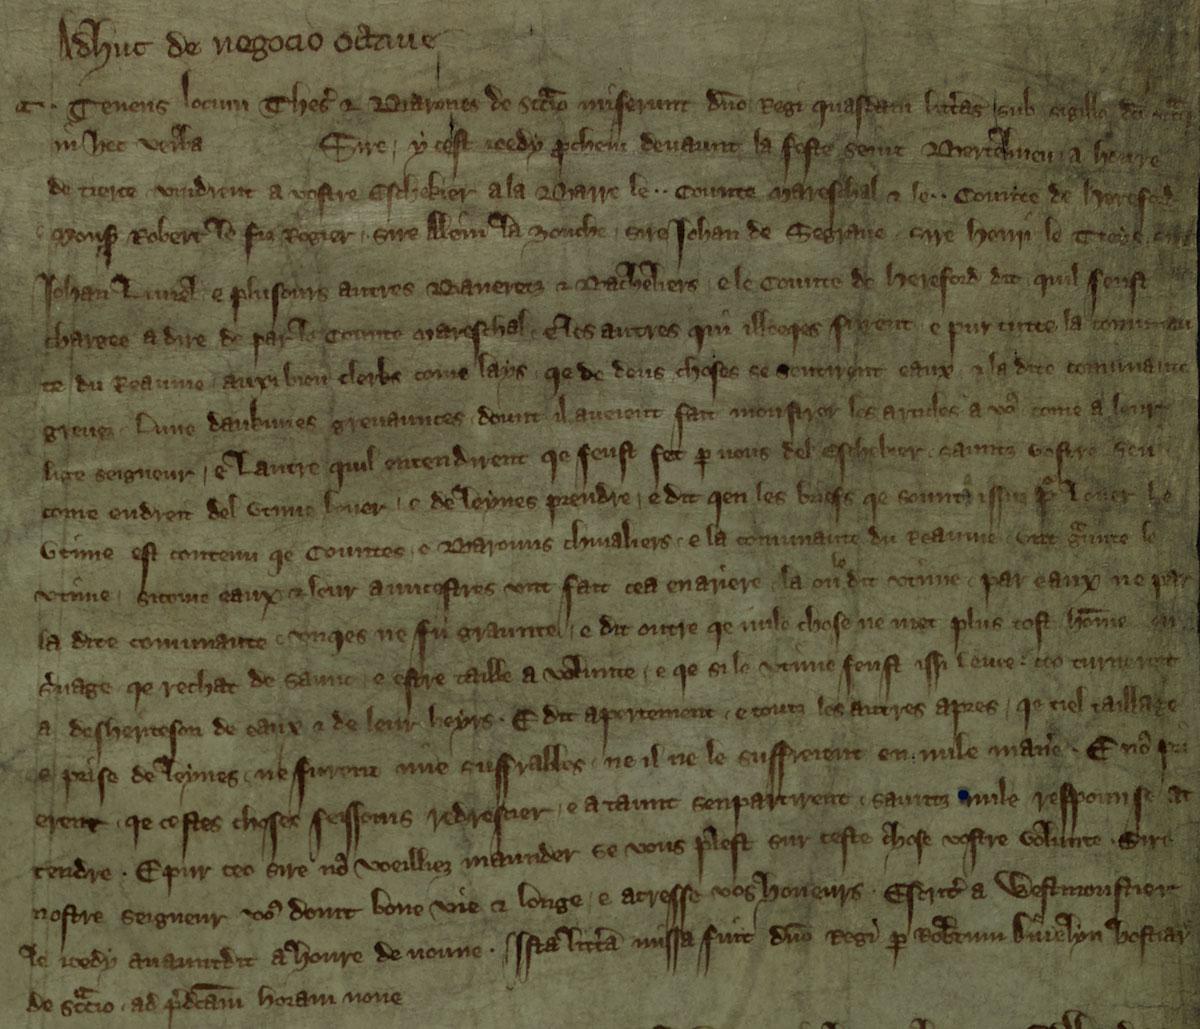 Statement by Roger Bigod and Henry de Bohun, E159-70)